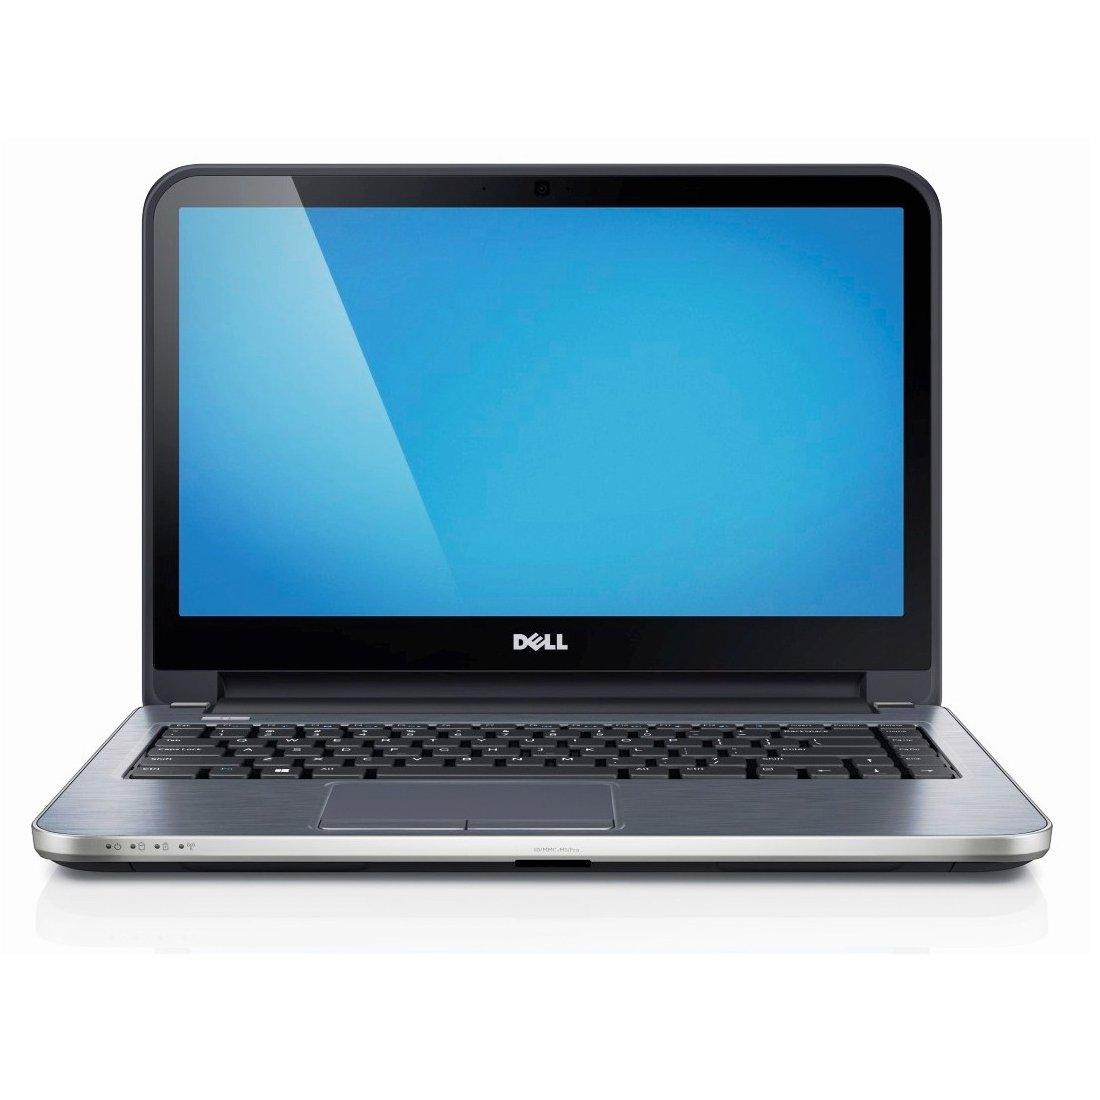 Dell-Inspiron-14R-i14RMT-7475sLV-14-Inch-Touchscreen-Laptop-Moon-Silver-